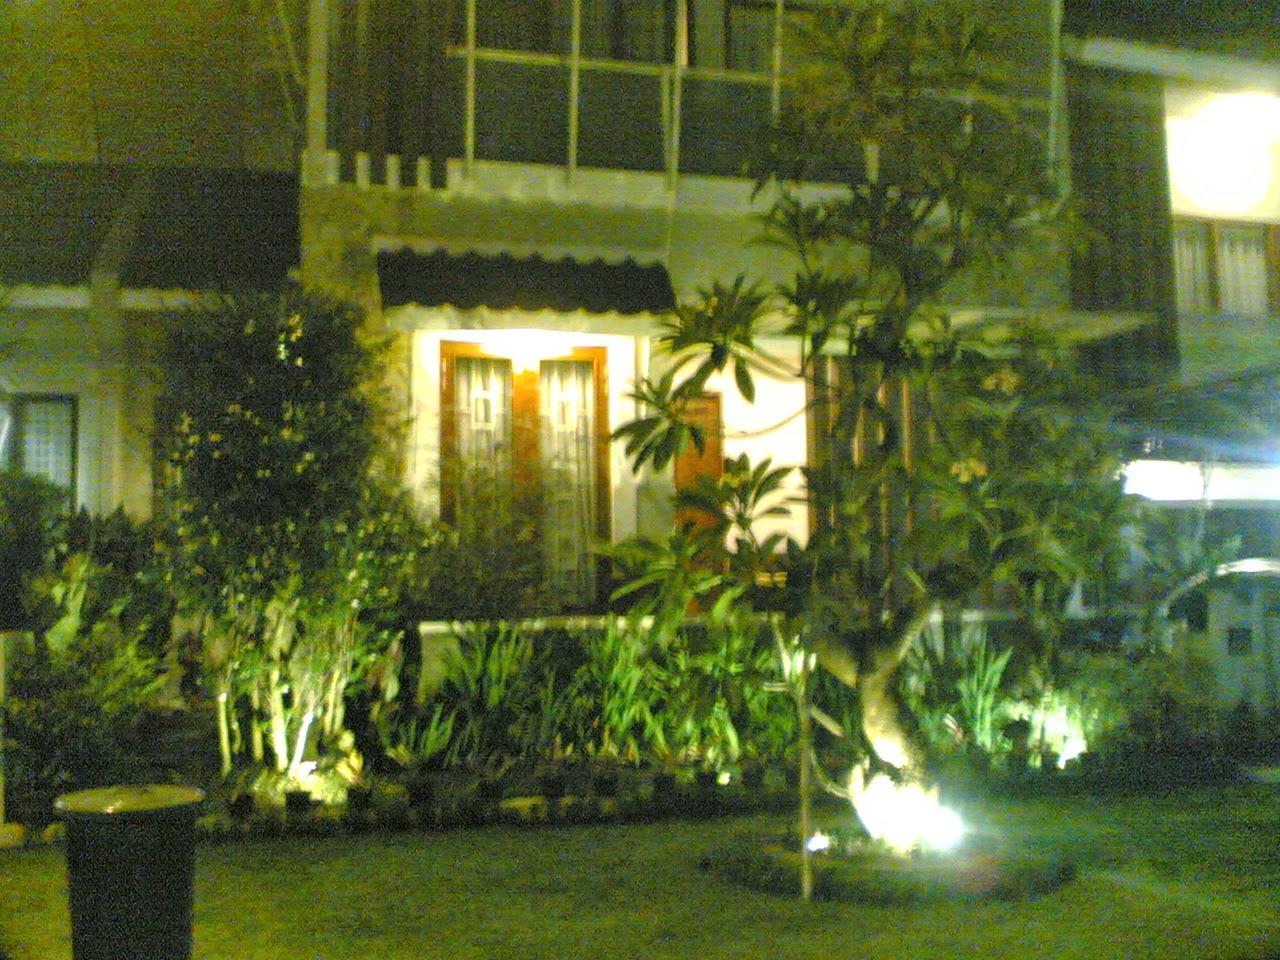 Jasa tukang taman | Kontraktor taman | Taman minimalis | Jual tanaman hias | Suplier tanaman hias |  Renovasi taman | Rumput gajah mini | Saung gazebo | Kolam minimalis